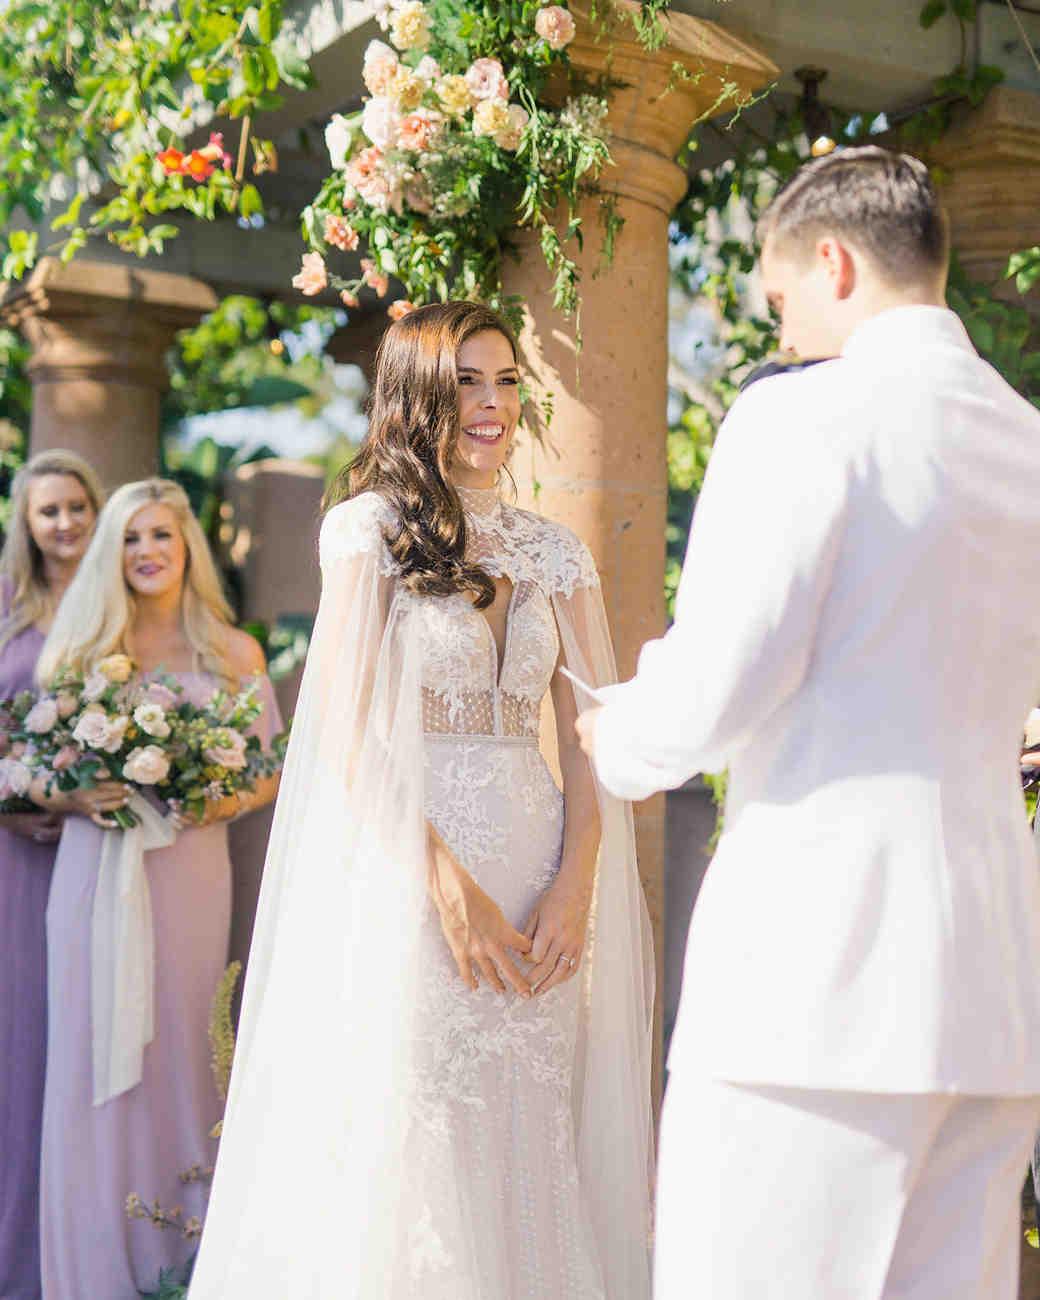 paige zack wedding ceremony bride and groom